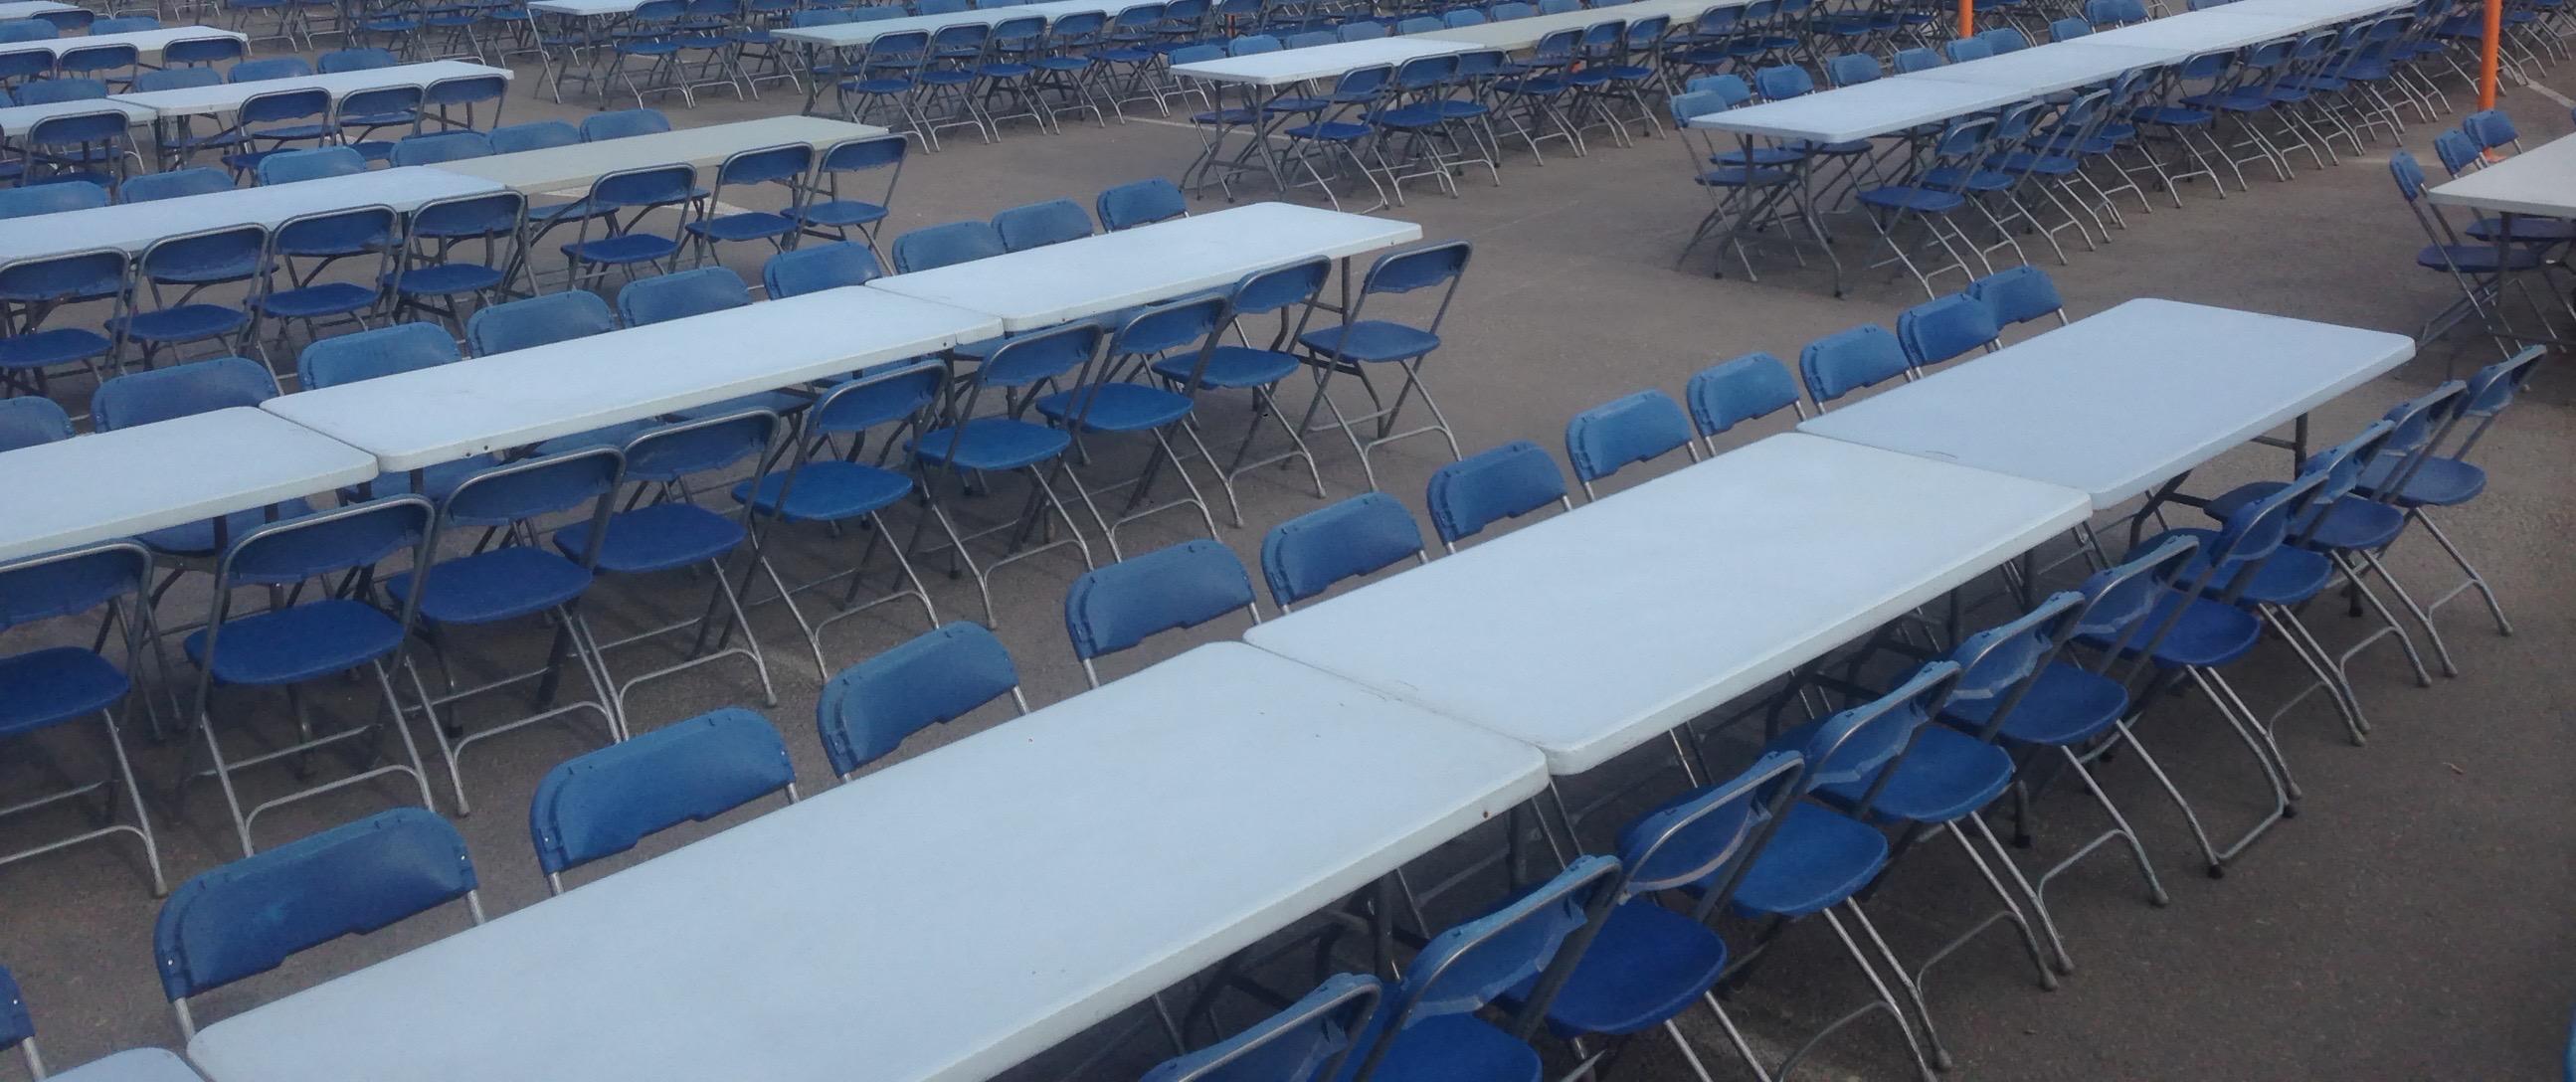 Buñol 2015  almuerzo popular